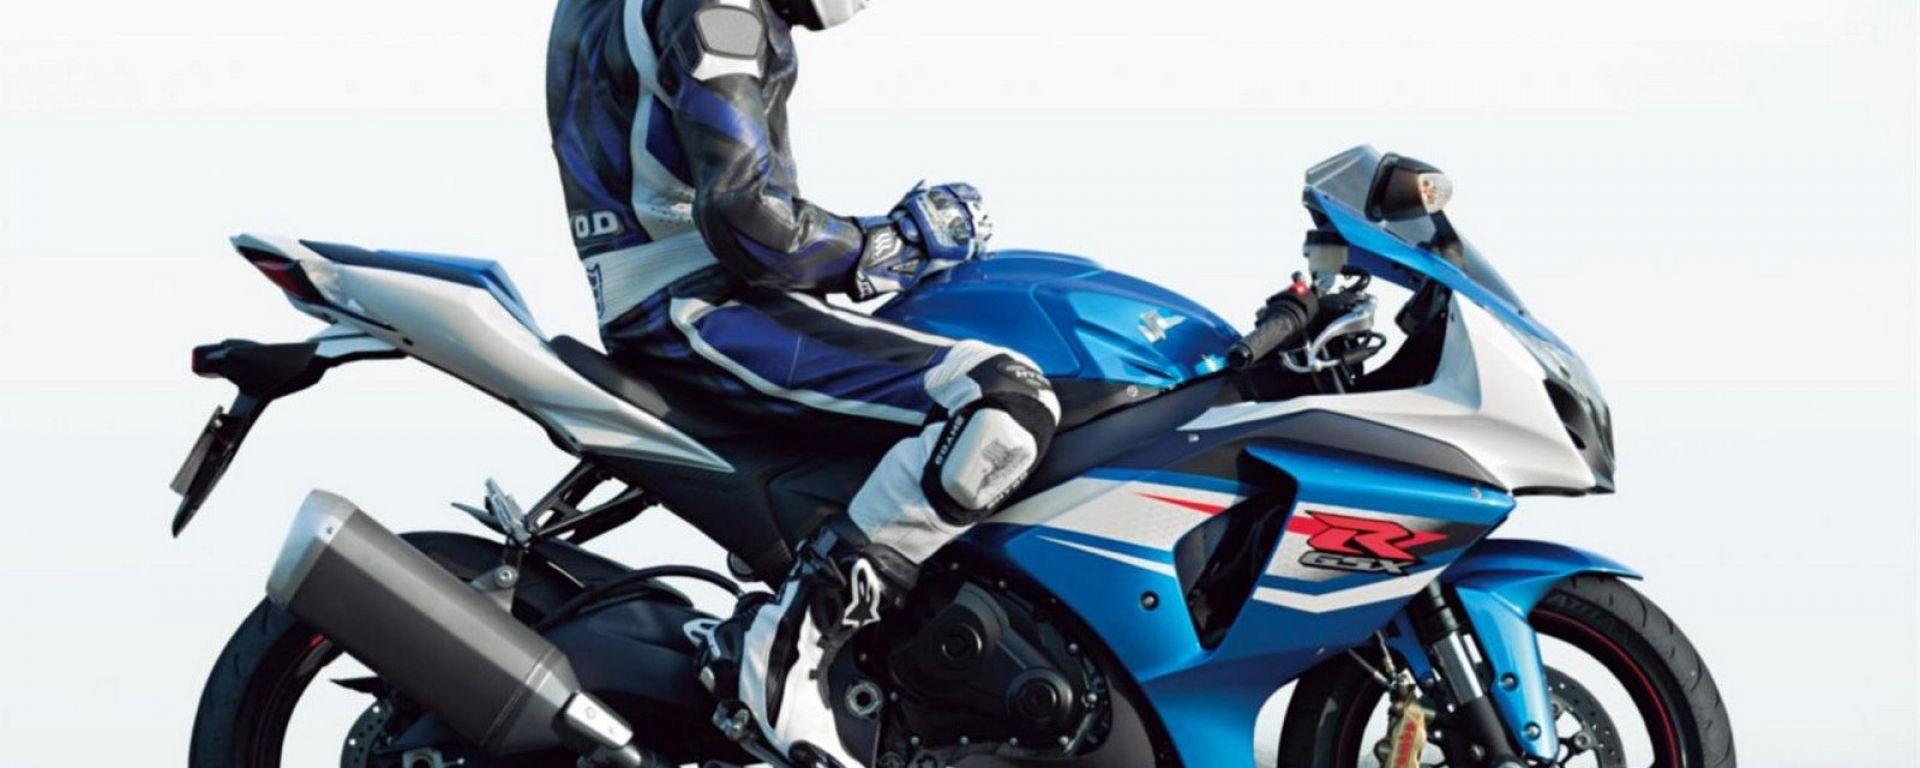 Suzuki supervaluta l'usato